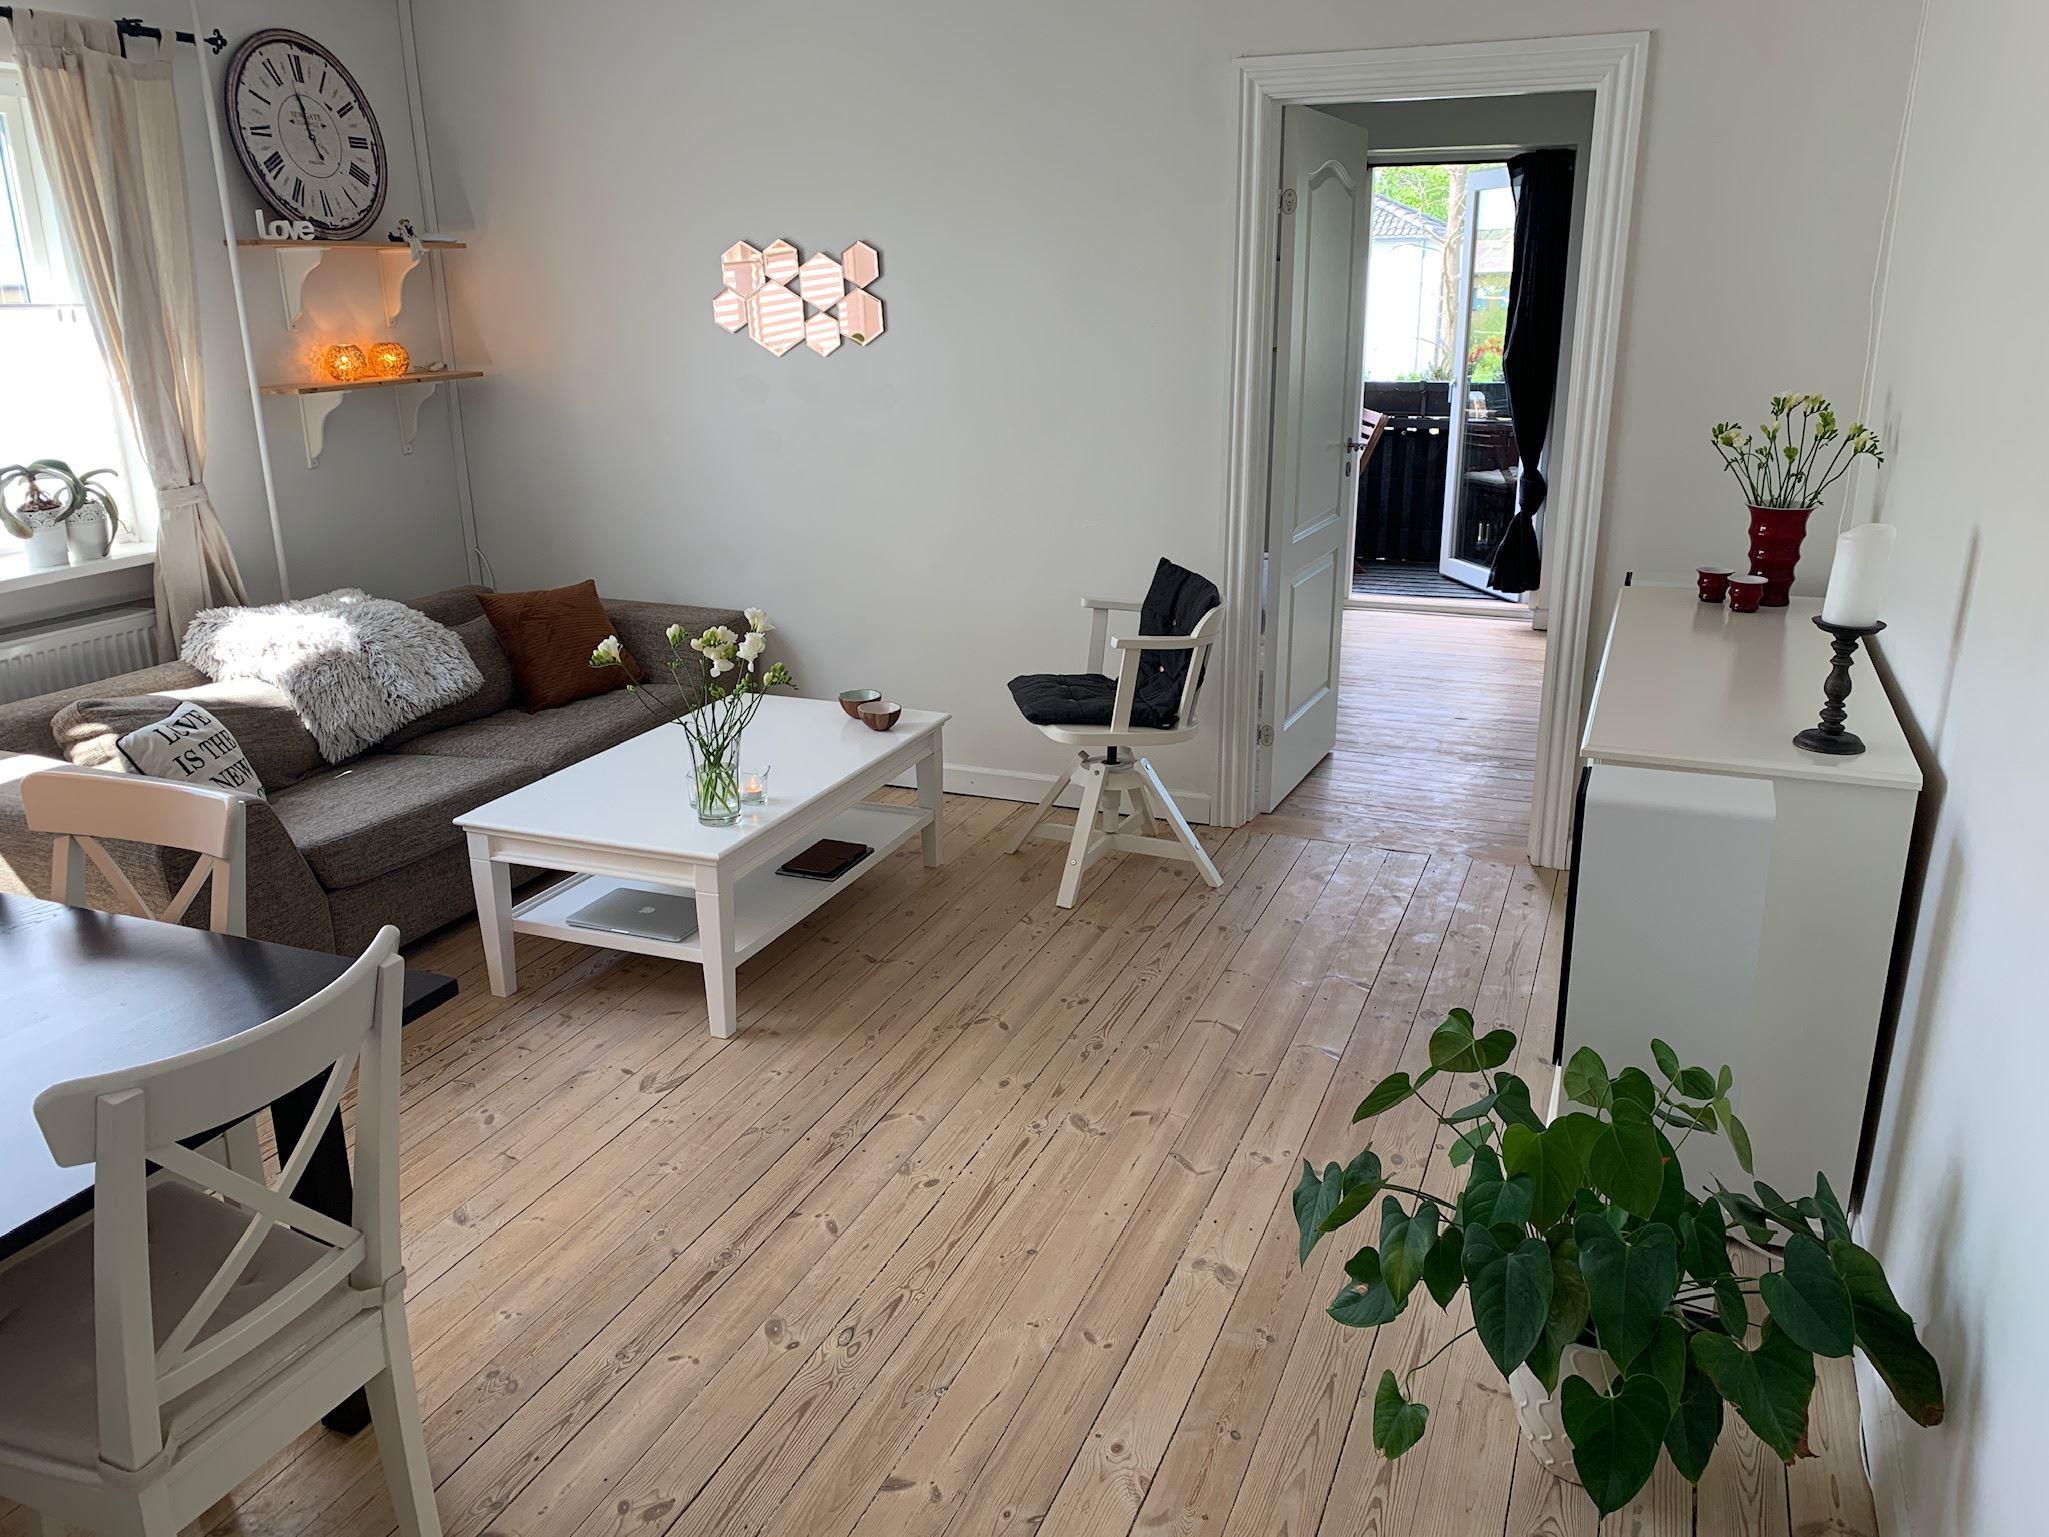 Esberns Alle 1, 1.  nr. 3, 2860 Søborg